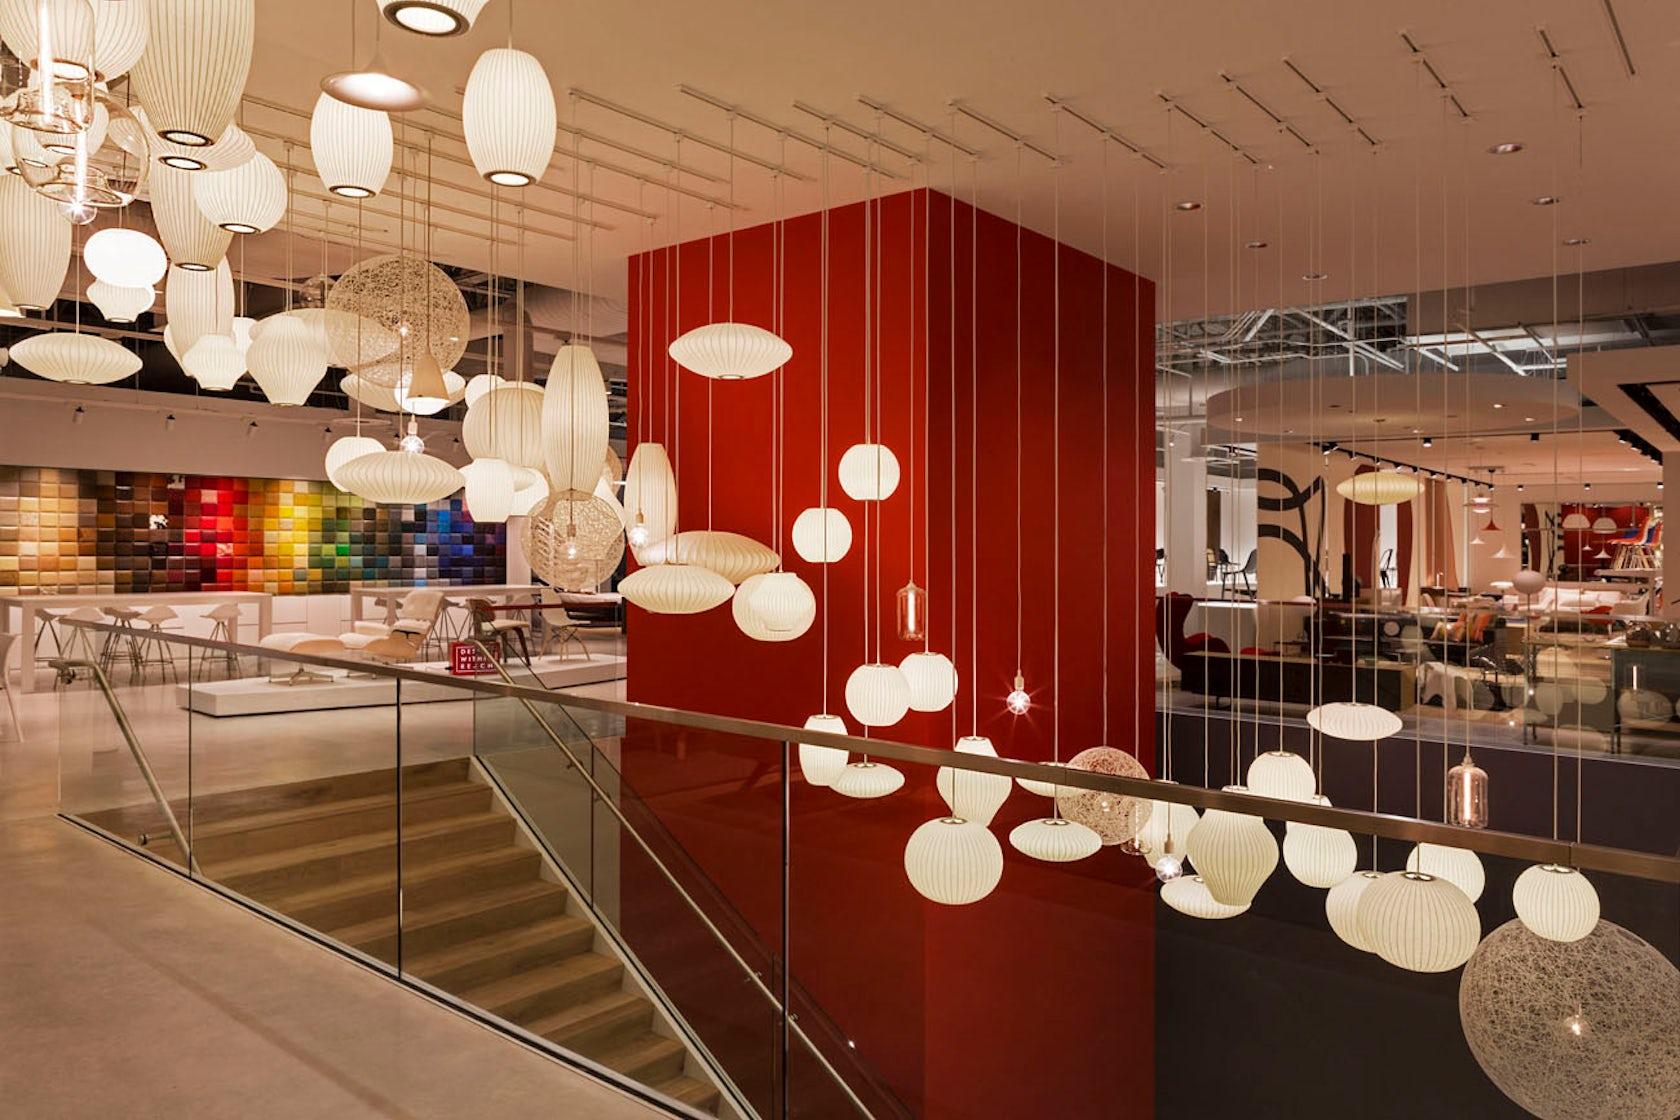 design within reach chicago architizer. Black Bedroom Furniture Sets. Home Design Ideas